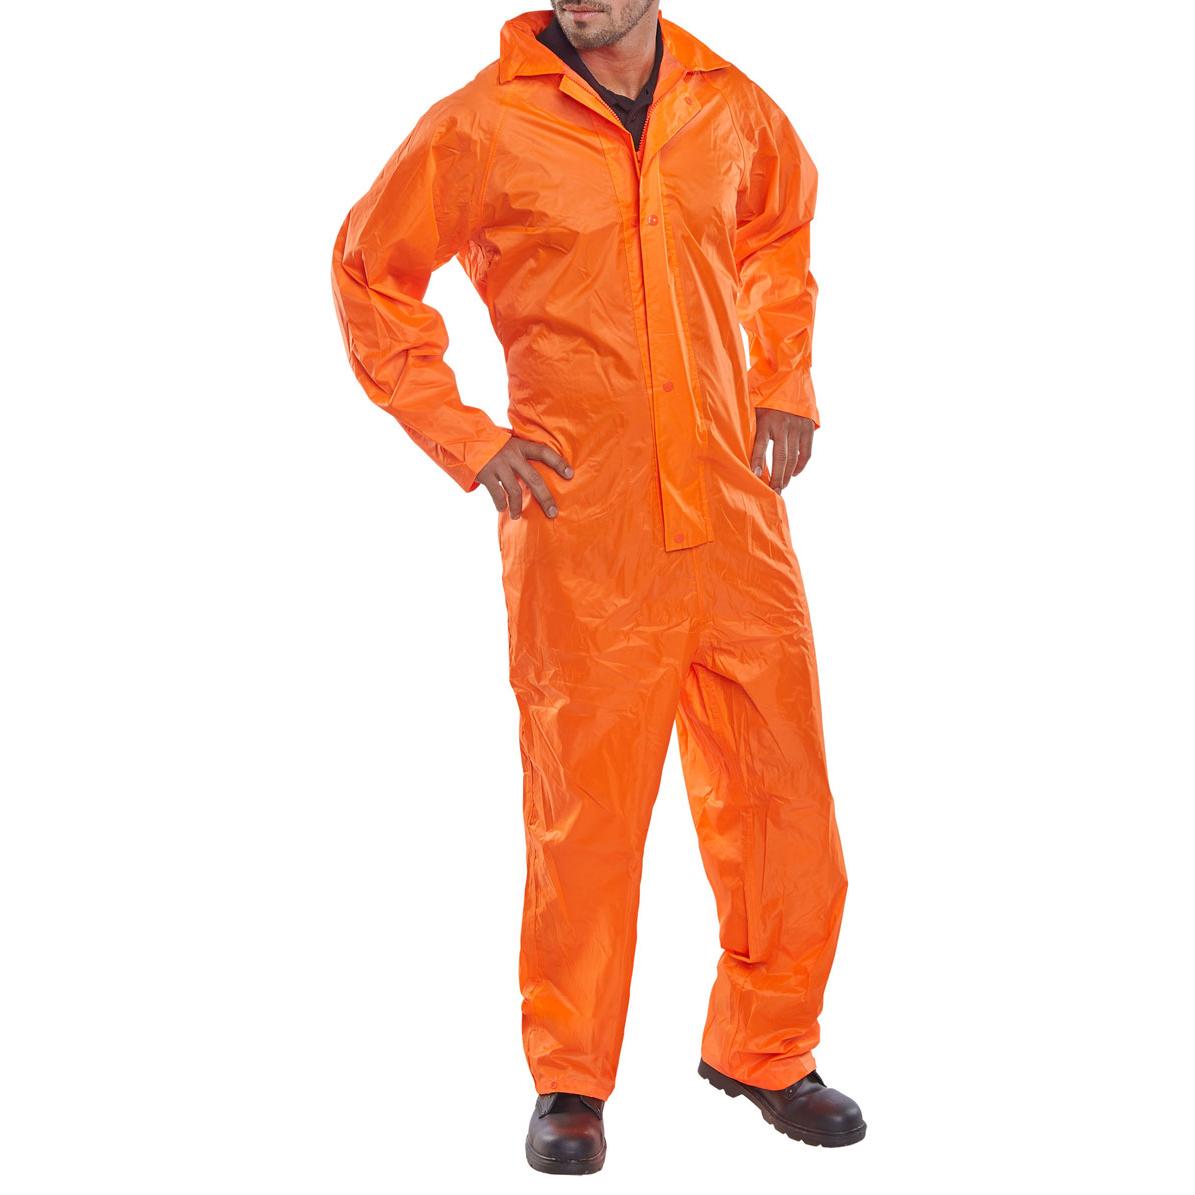 B-Dri Weatherproof Coveralls Nylon 3XL Orange Ref NBDCORXXXL *Up to 3 Day Leadtime*